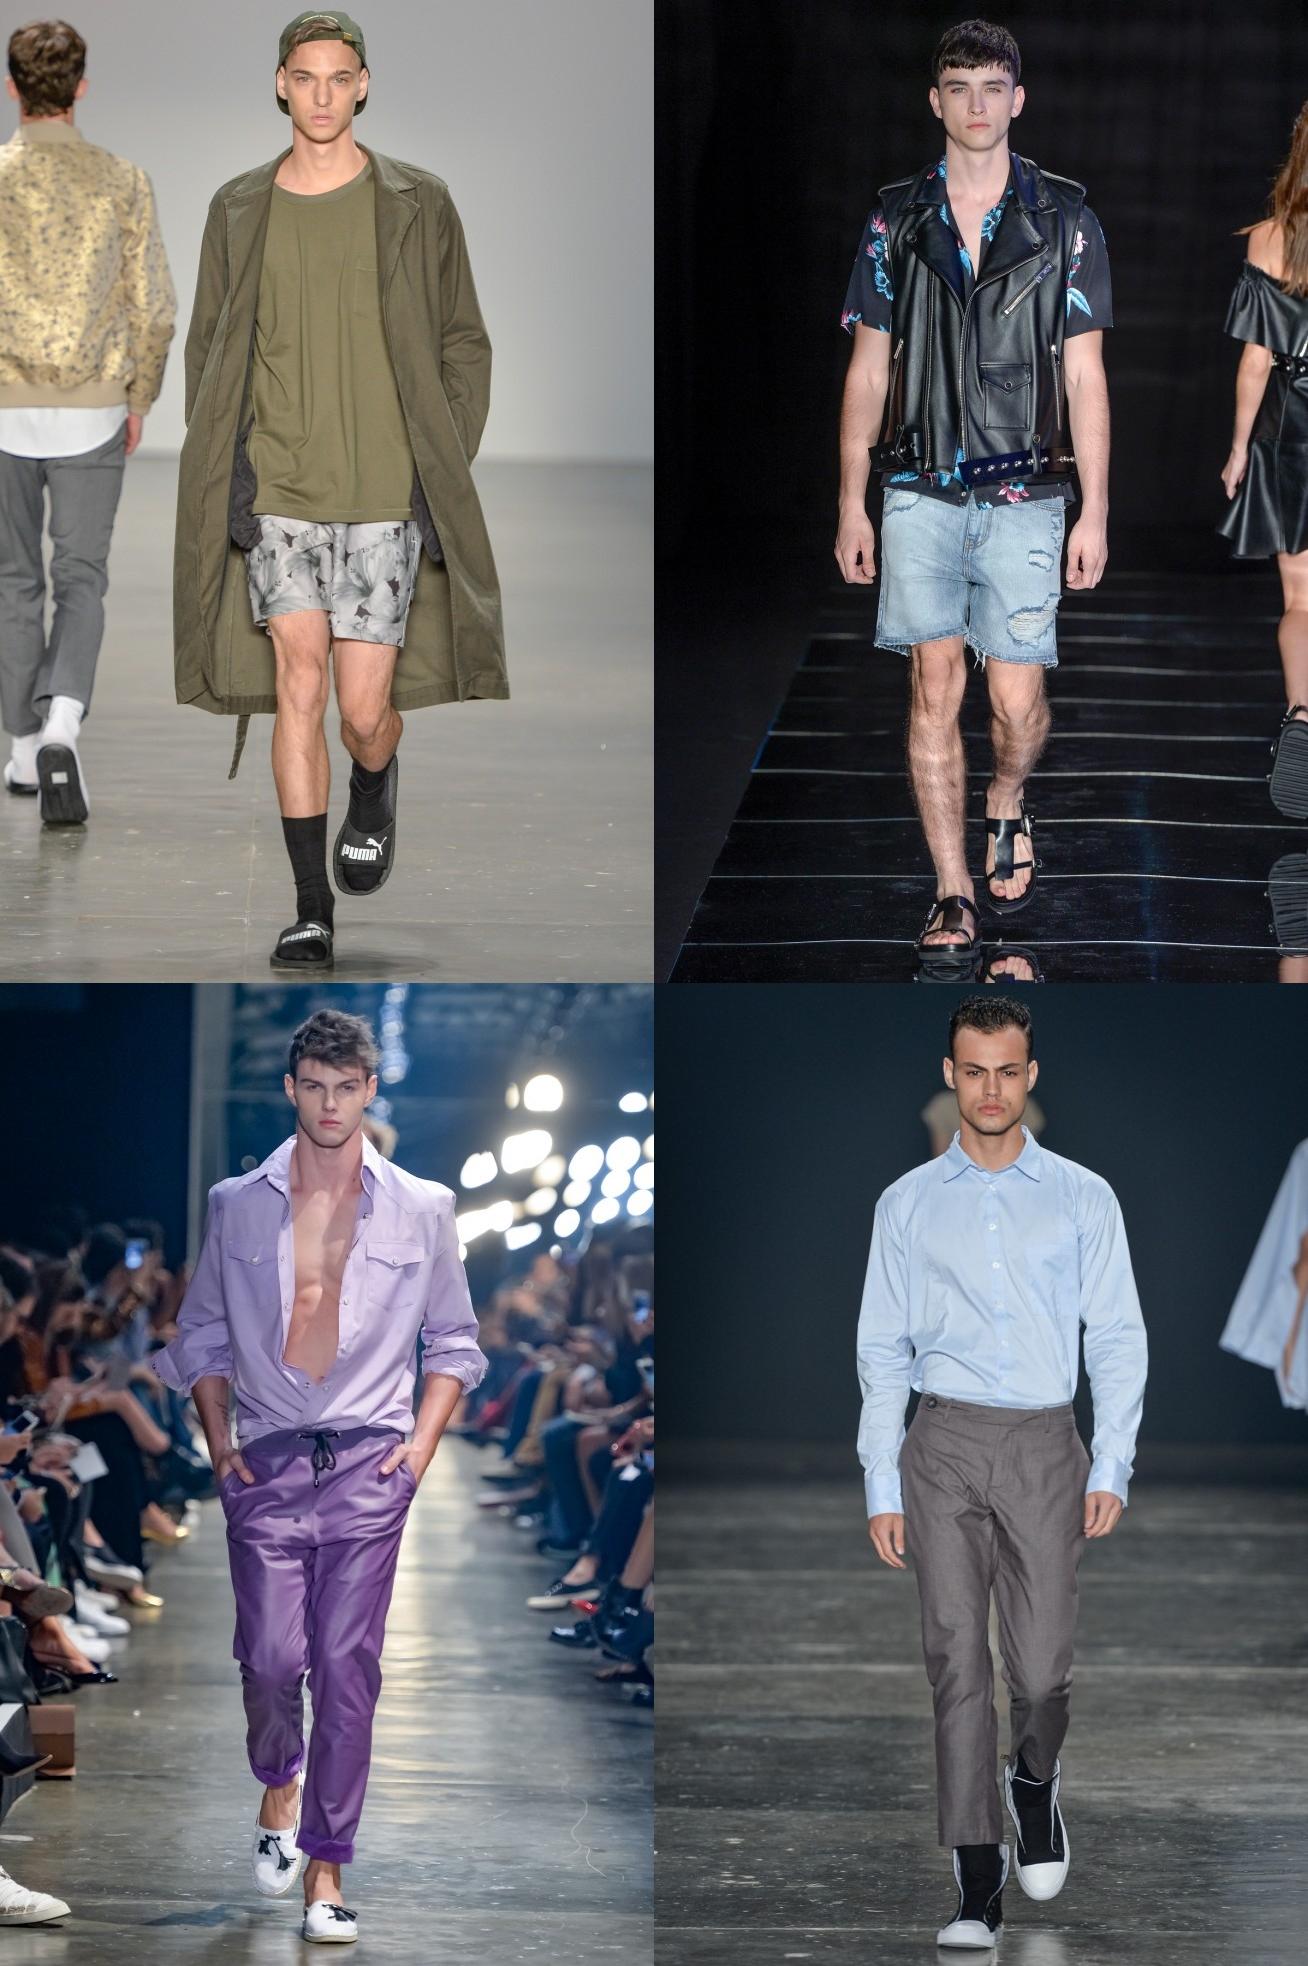 tendencia masculina, tendencias 2017, tendencias 2016, roupa masculina, moda masculina, dicas de moda, dicas de estilo, spfw, trend, alex cursino, moda sem censura